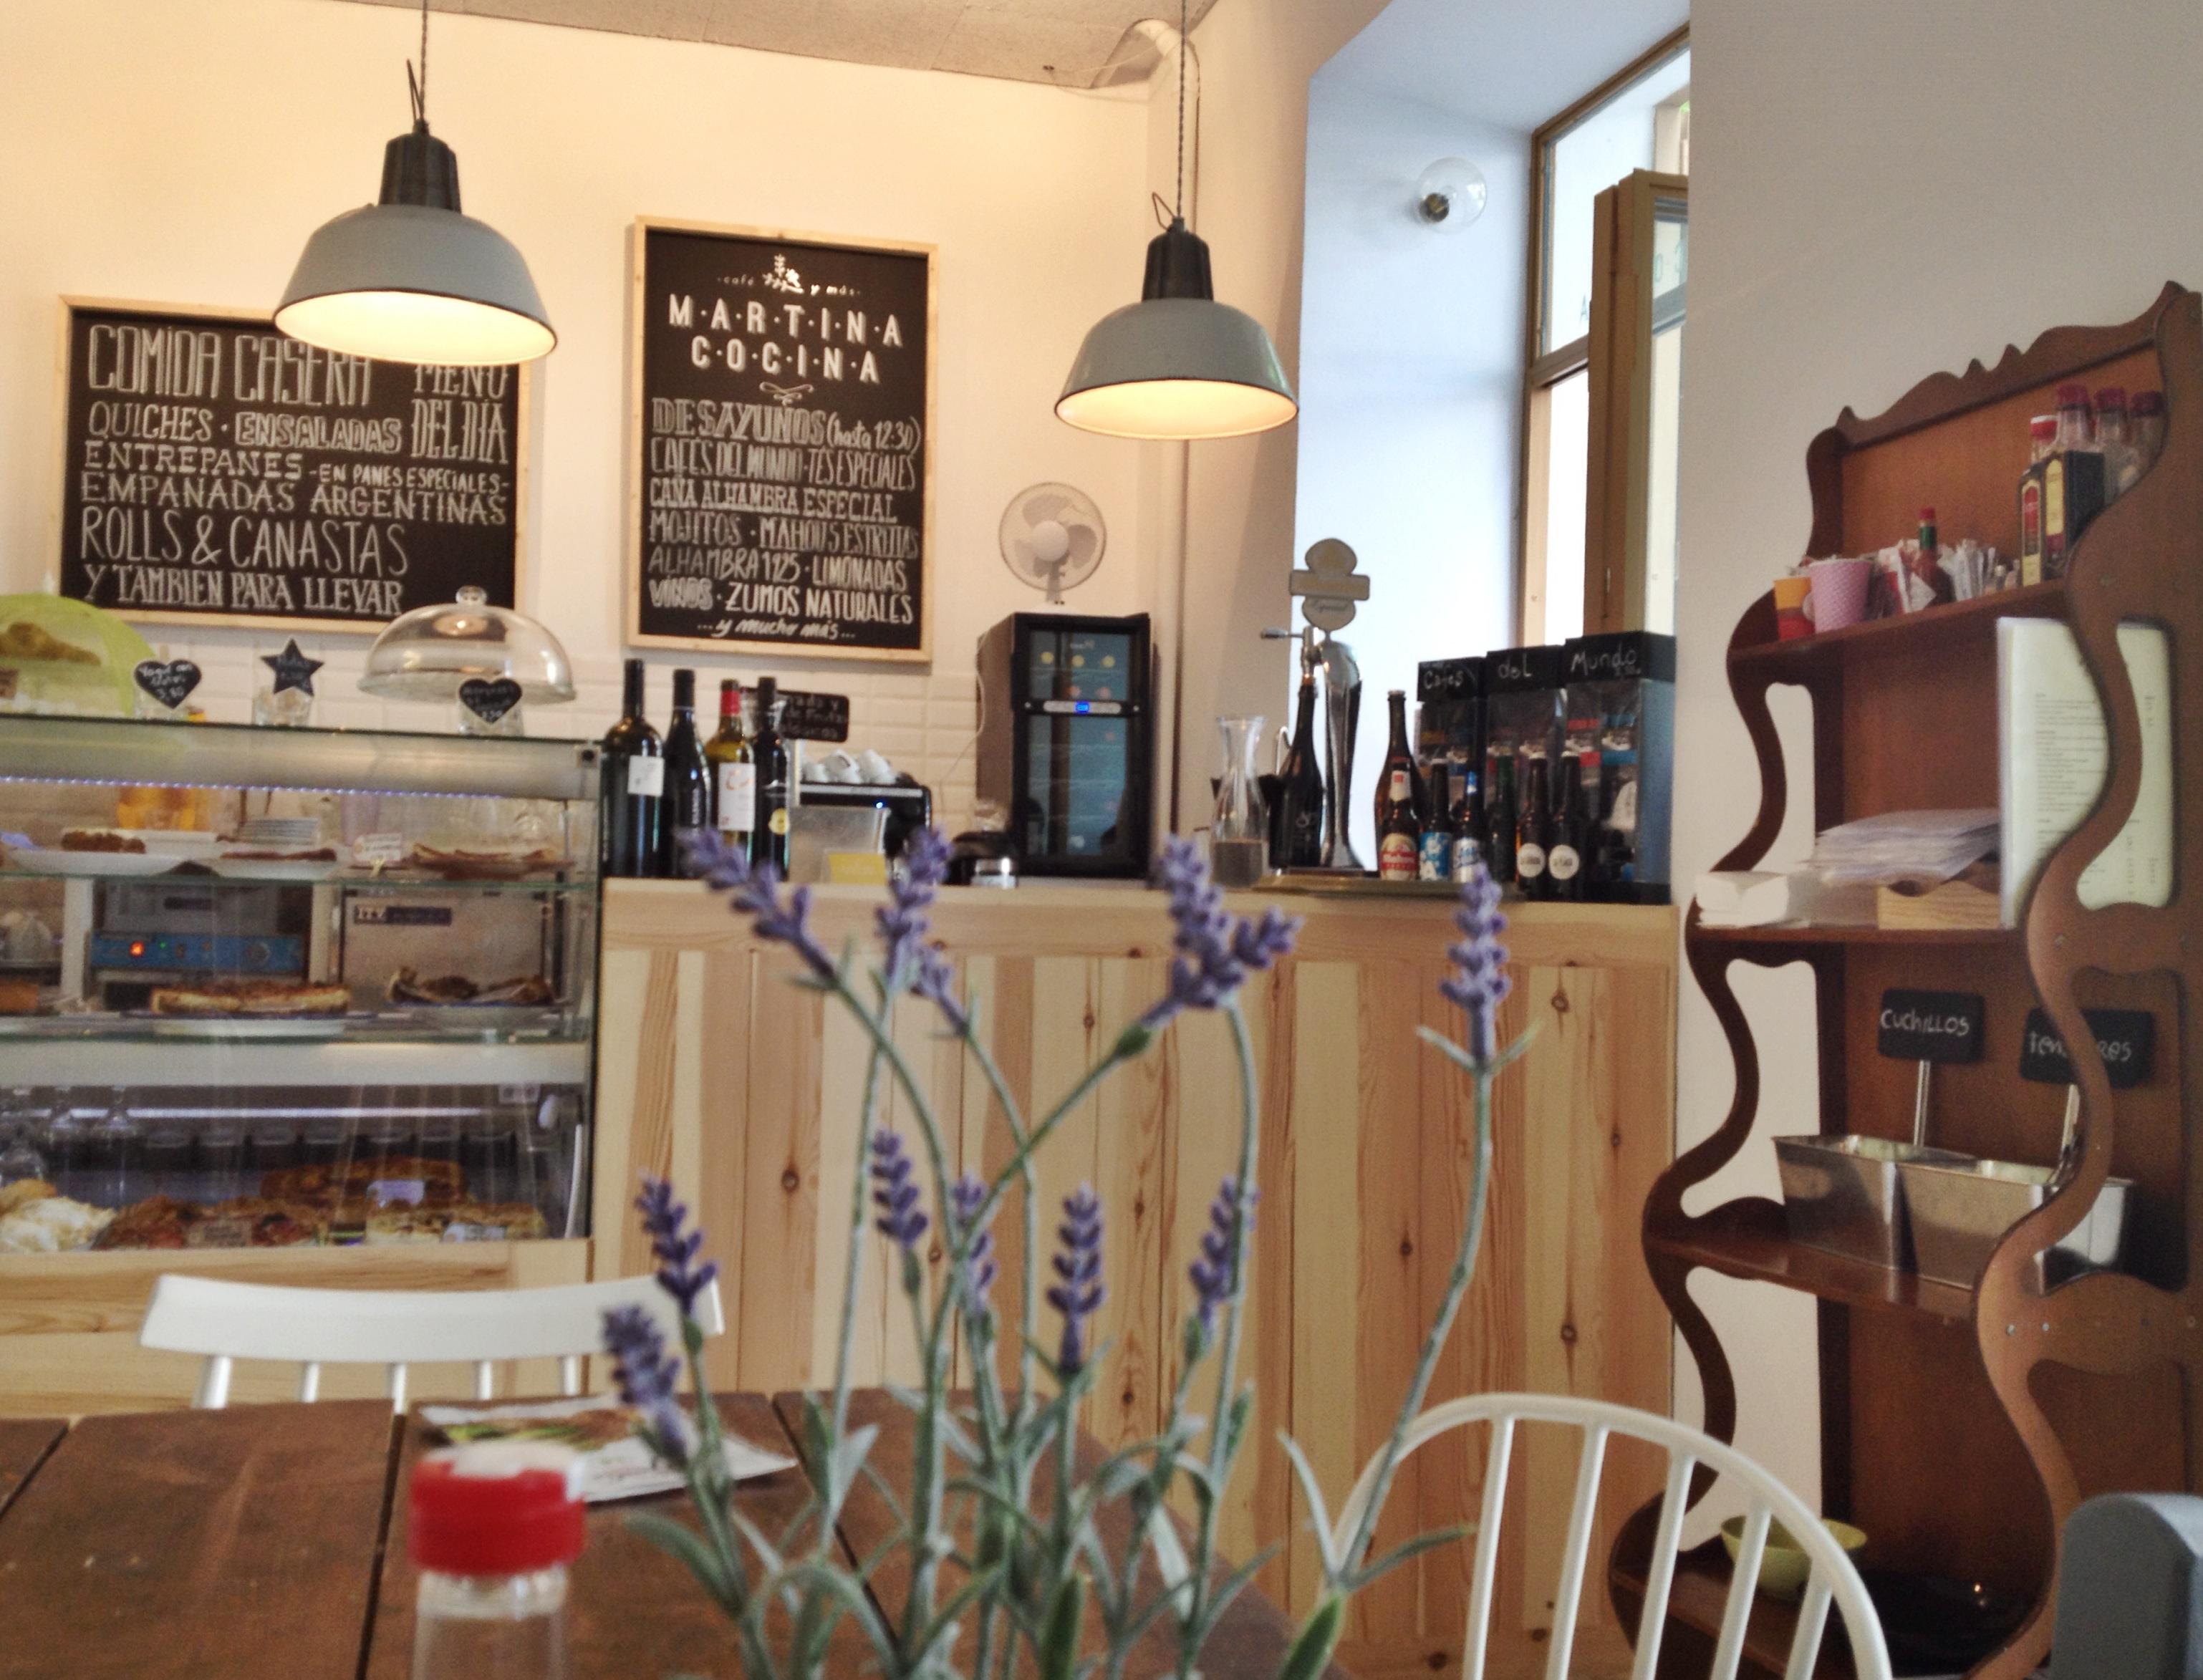 Elherviderosereune restaurantes lugares madrid ocio - Decoracion de restaurantes rusticos ...